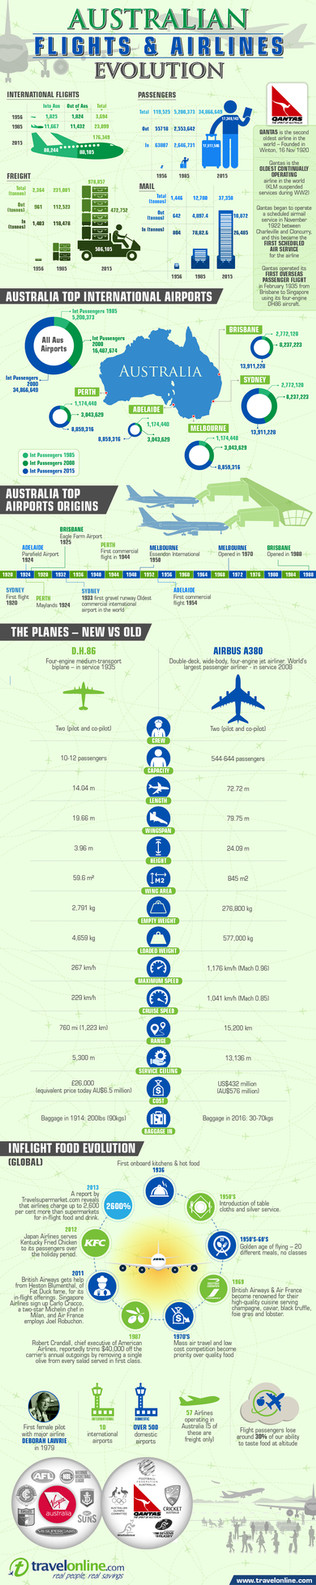 Australian Flights & Airlines Evolution